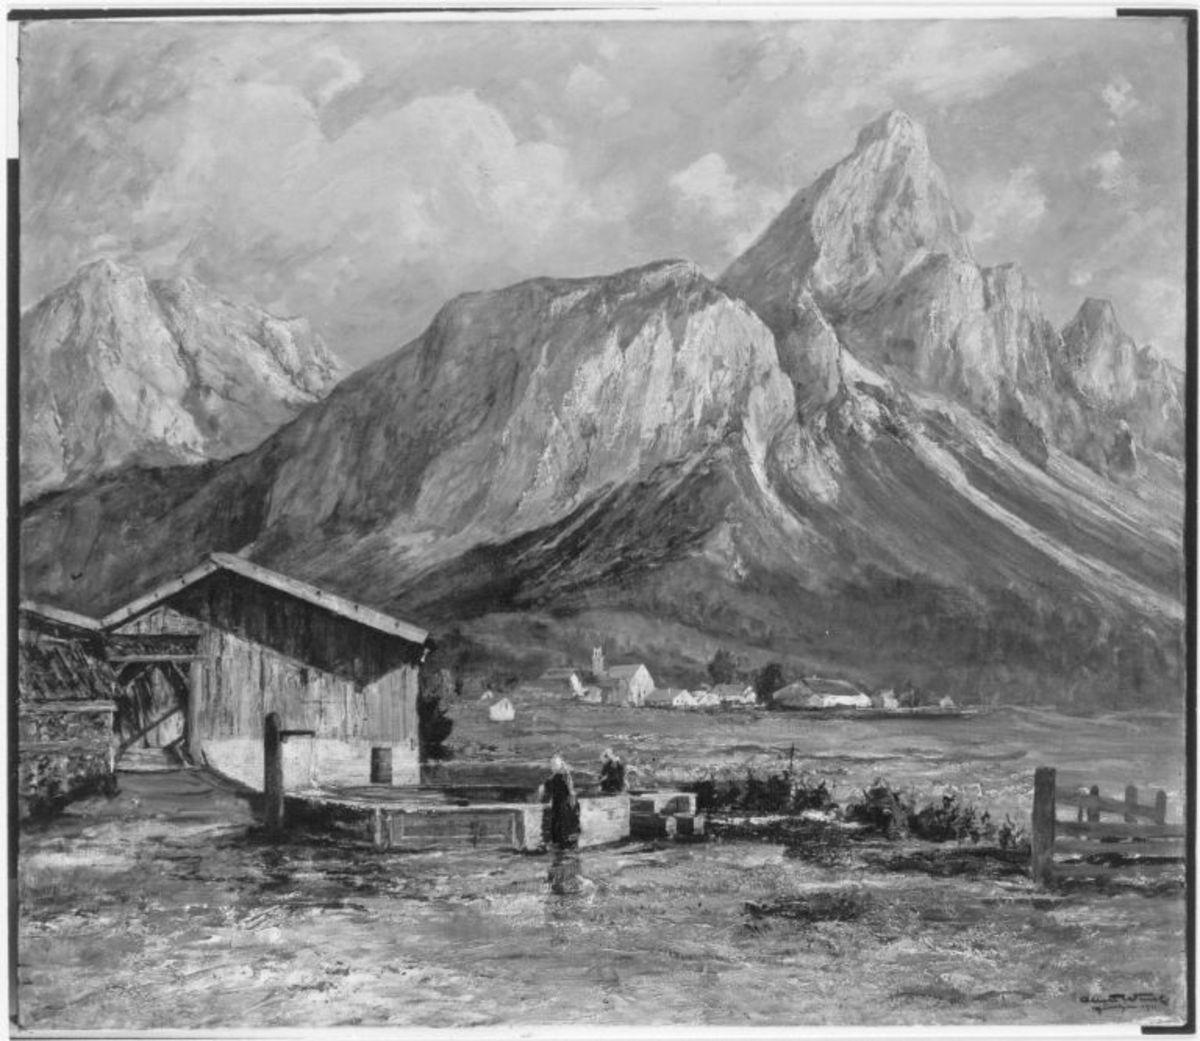 Die Soienspitze bei Ehrwald